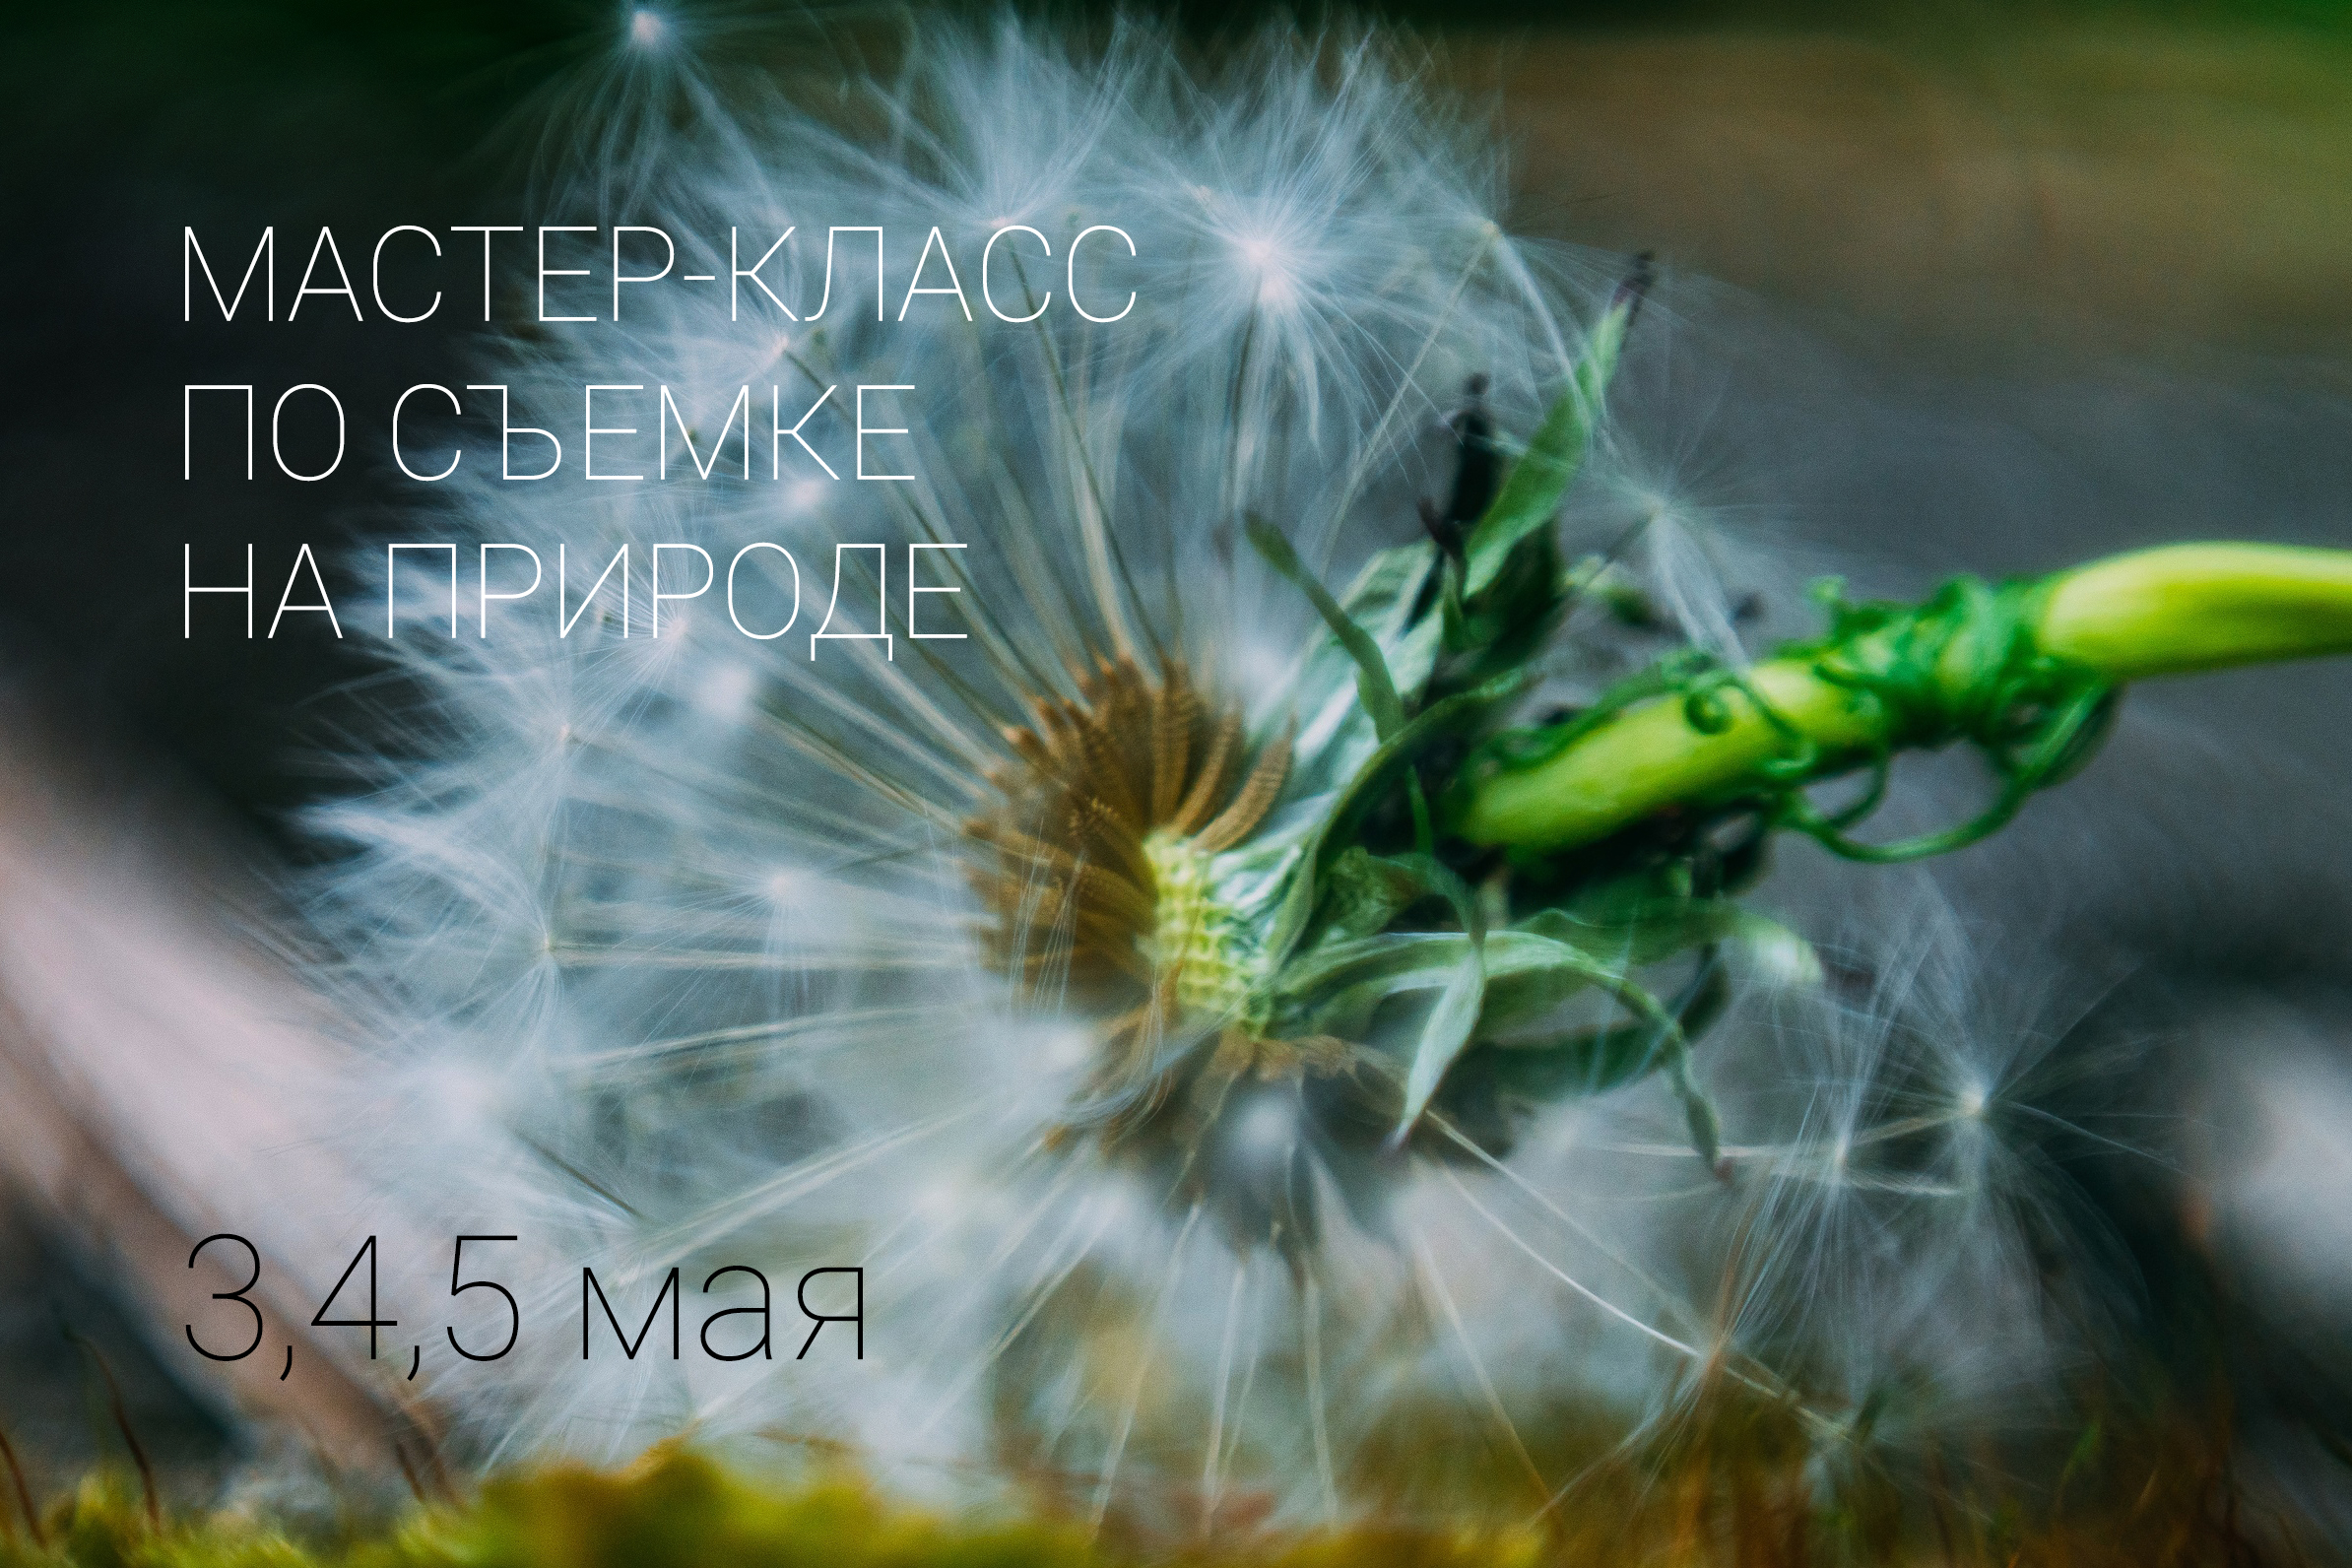 мастер-класс макро Екатеринбург